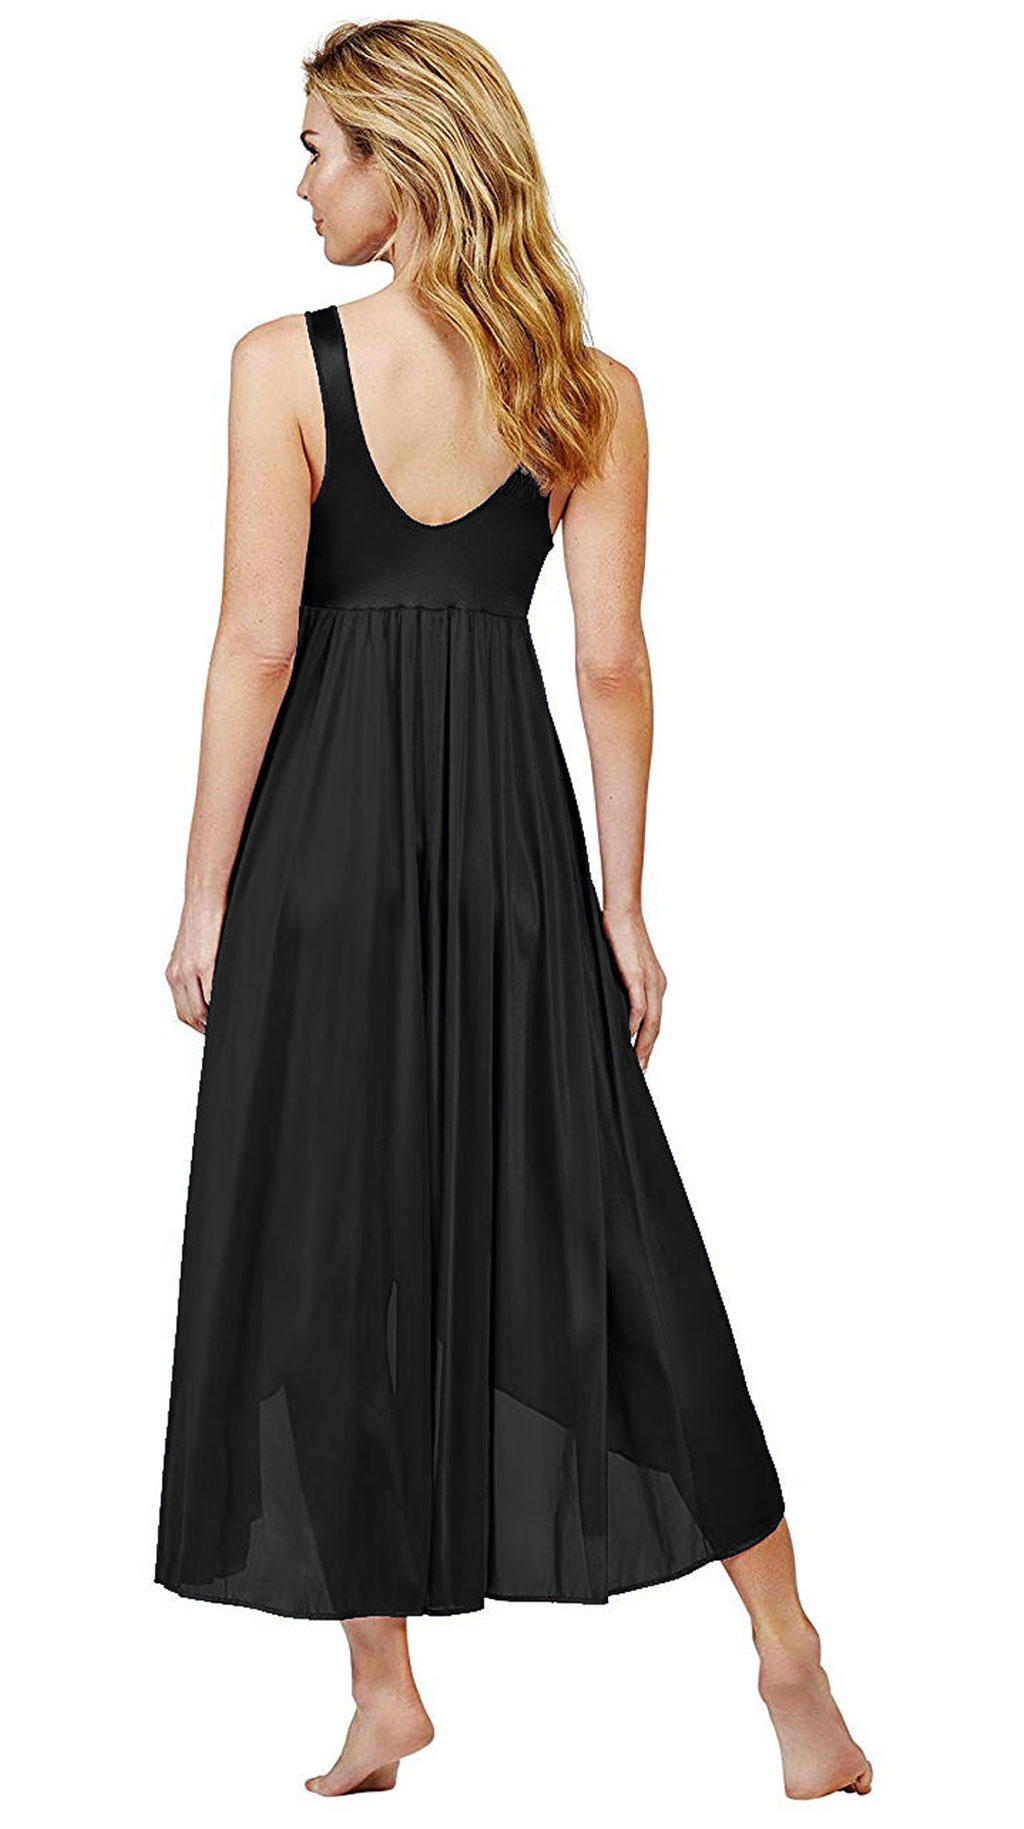 black peignoir nightgowns